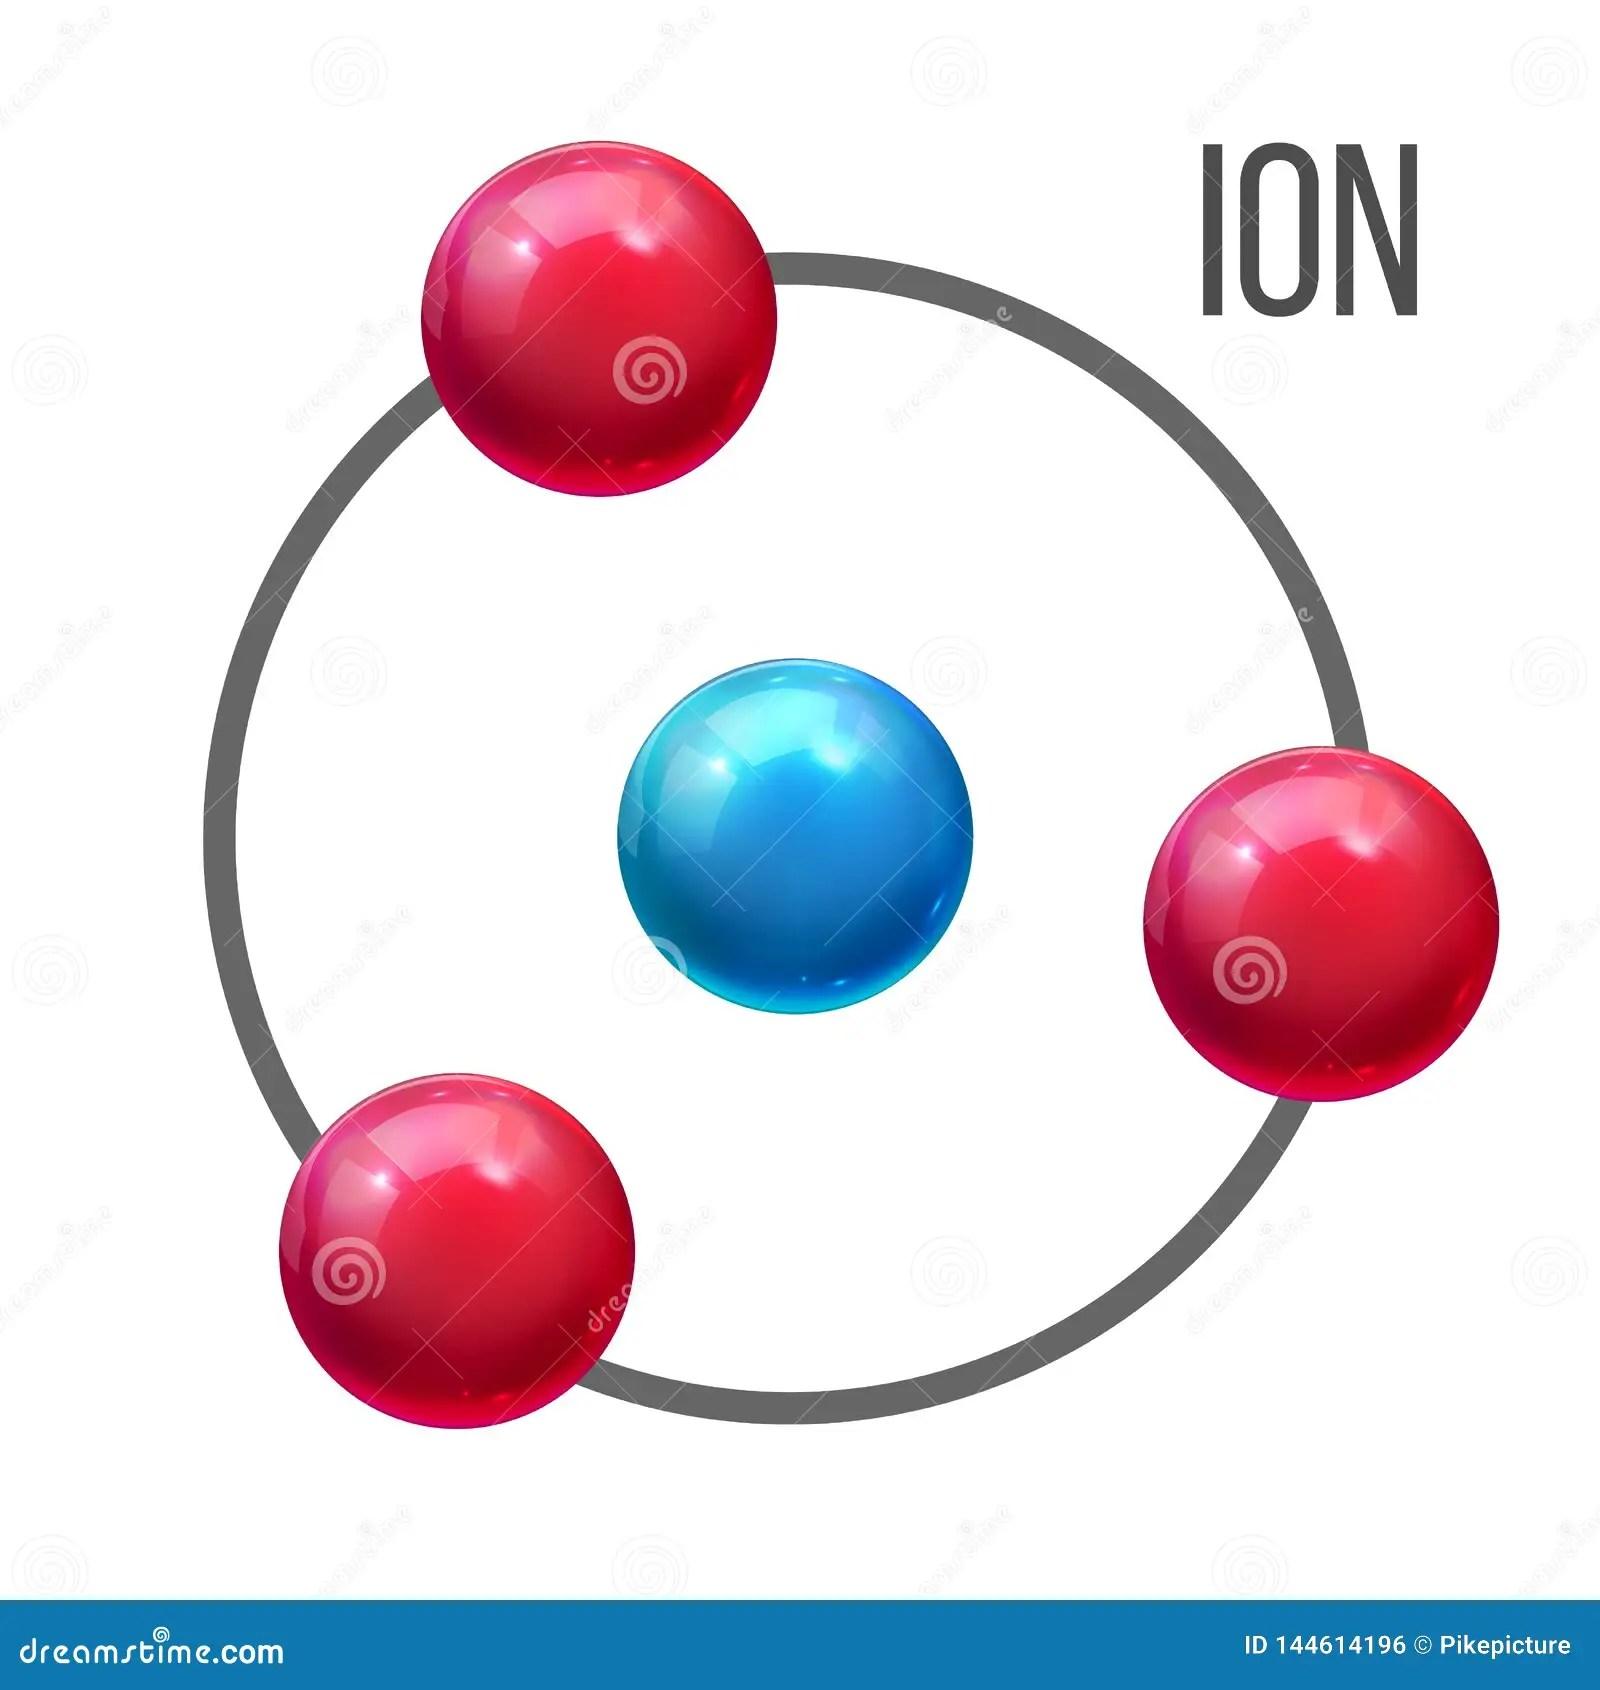 Ion Atom Molecule Education Vector Poster Template Stock